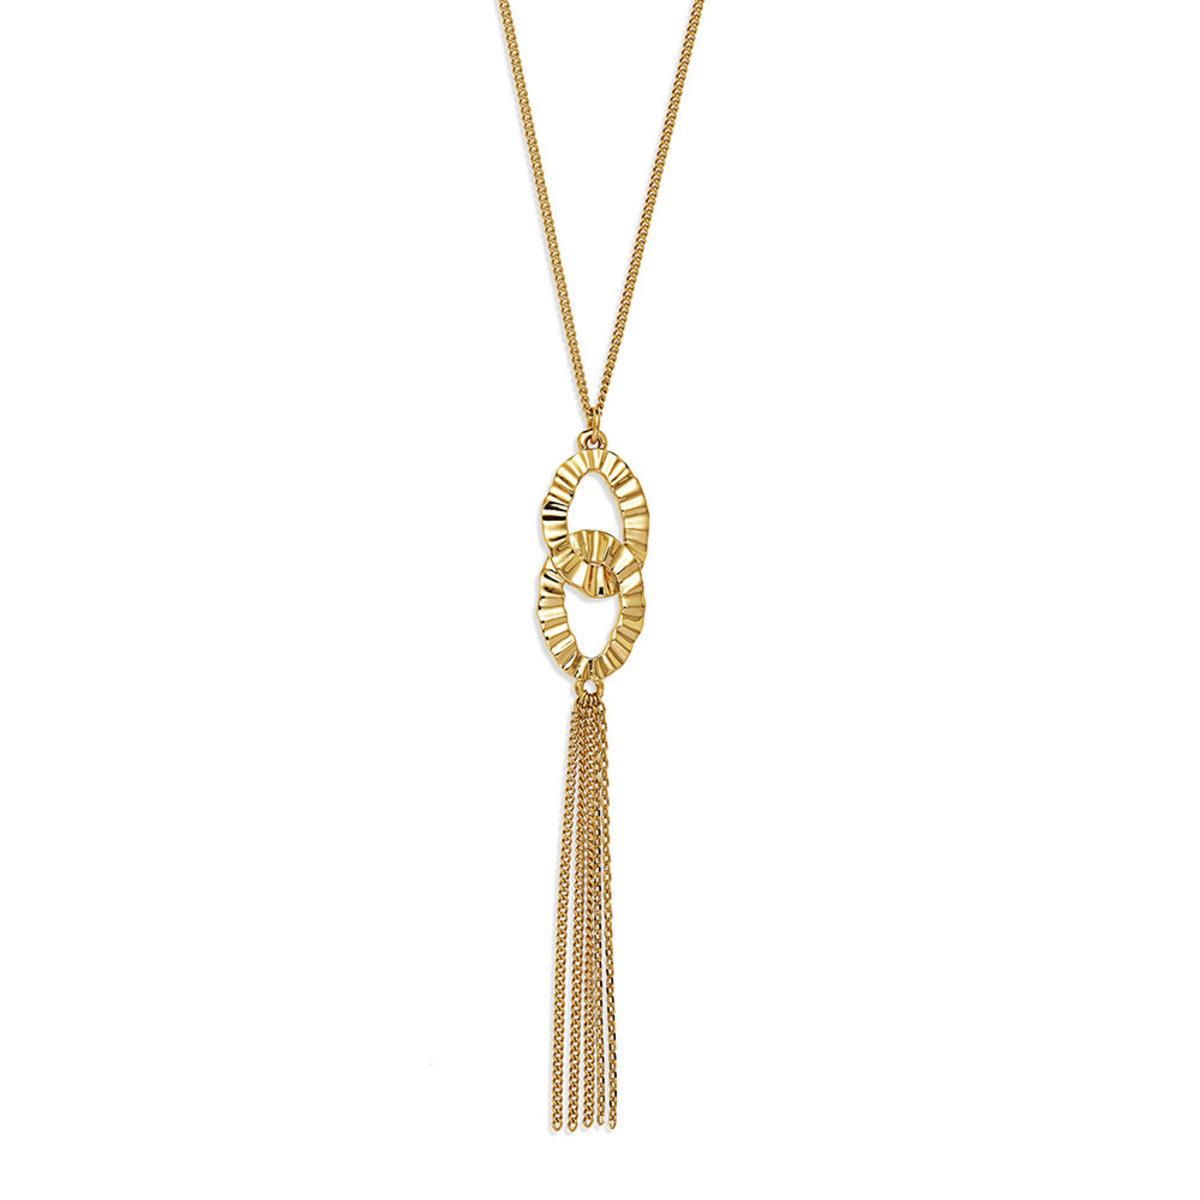 Glanz: gold plating, tassel necklace